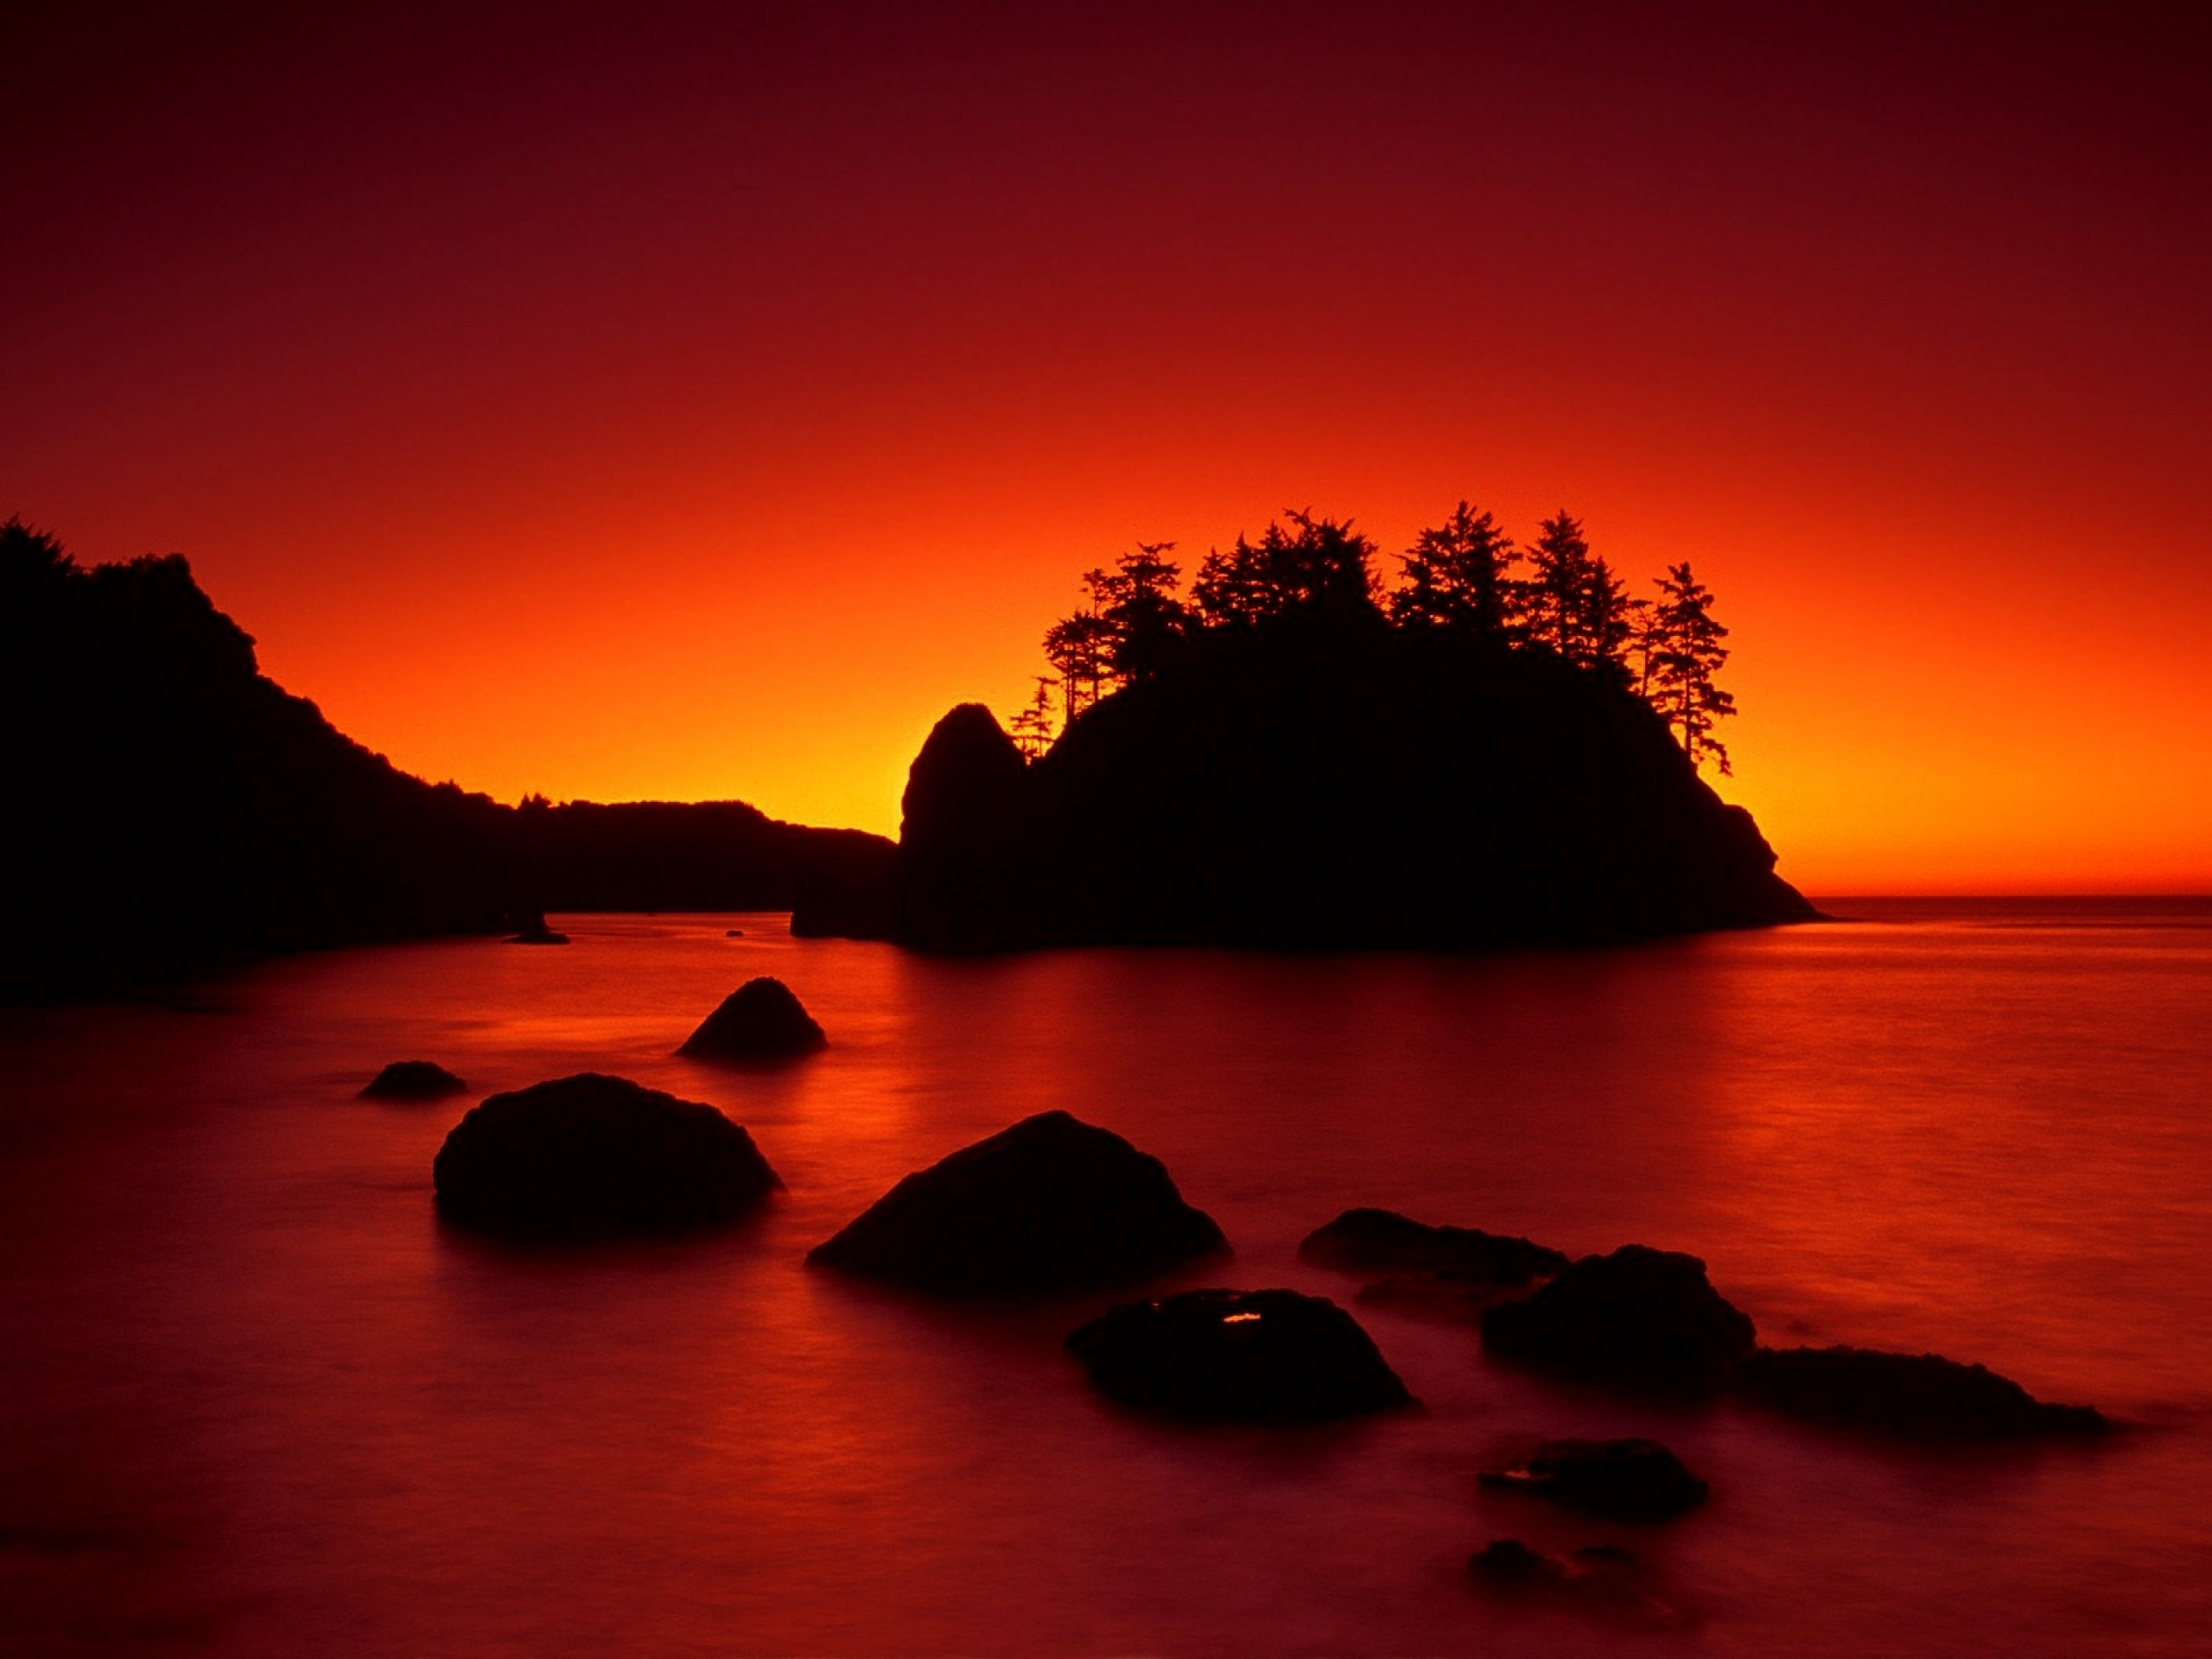 Res: 2560x1920, Bild: Red Sunset Ocean & Dark Island wallpapers and stock photos. Â«